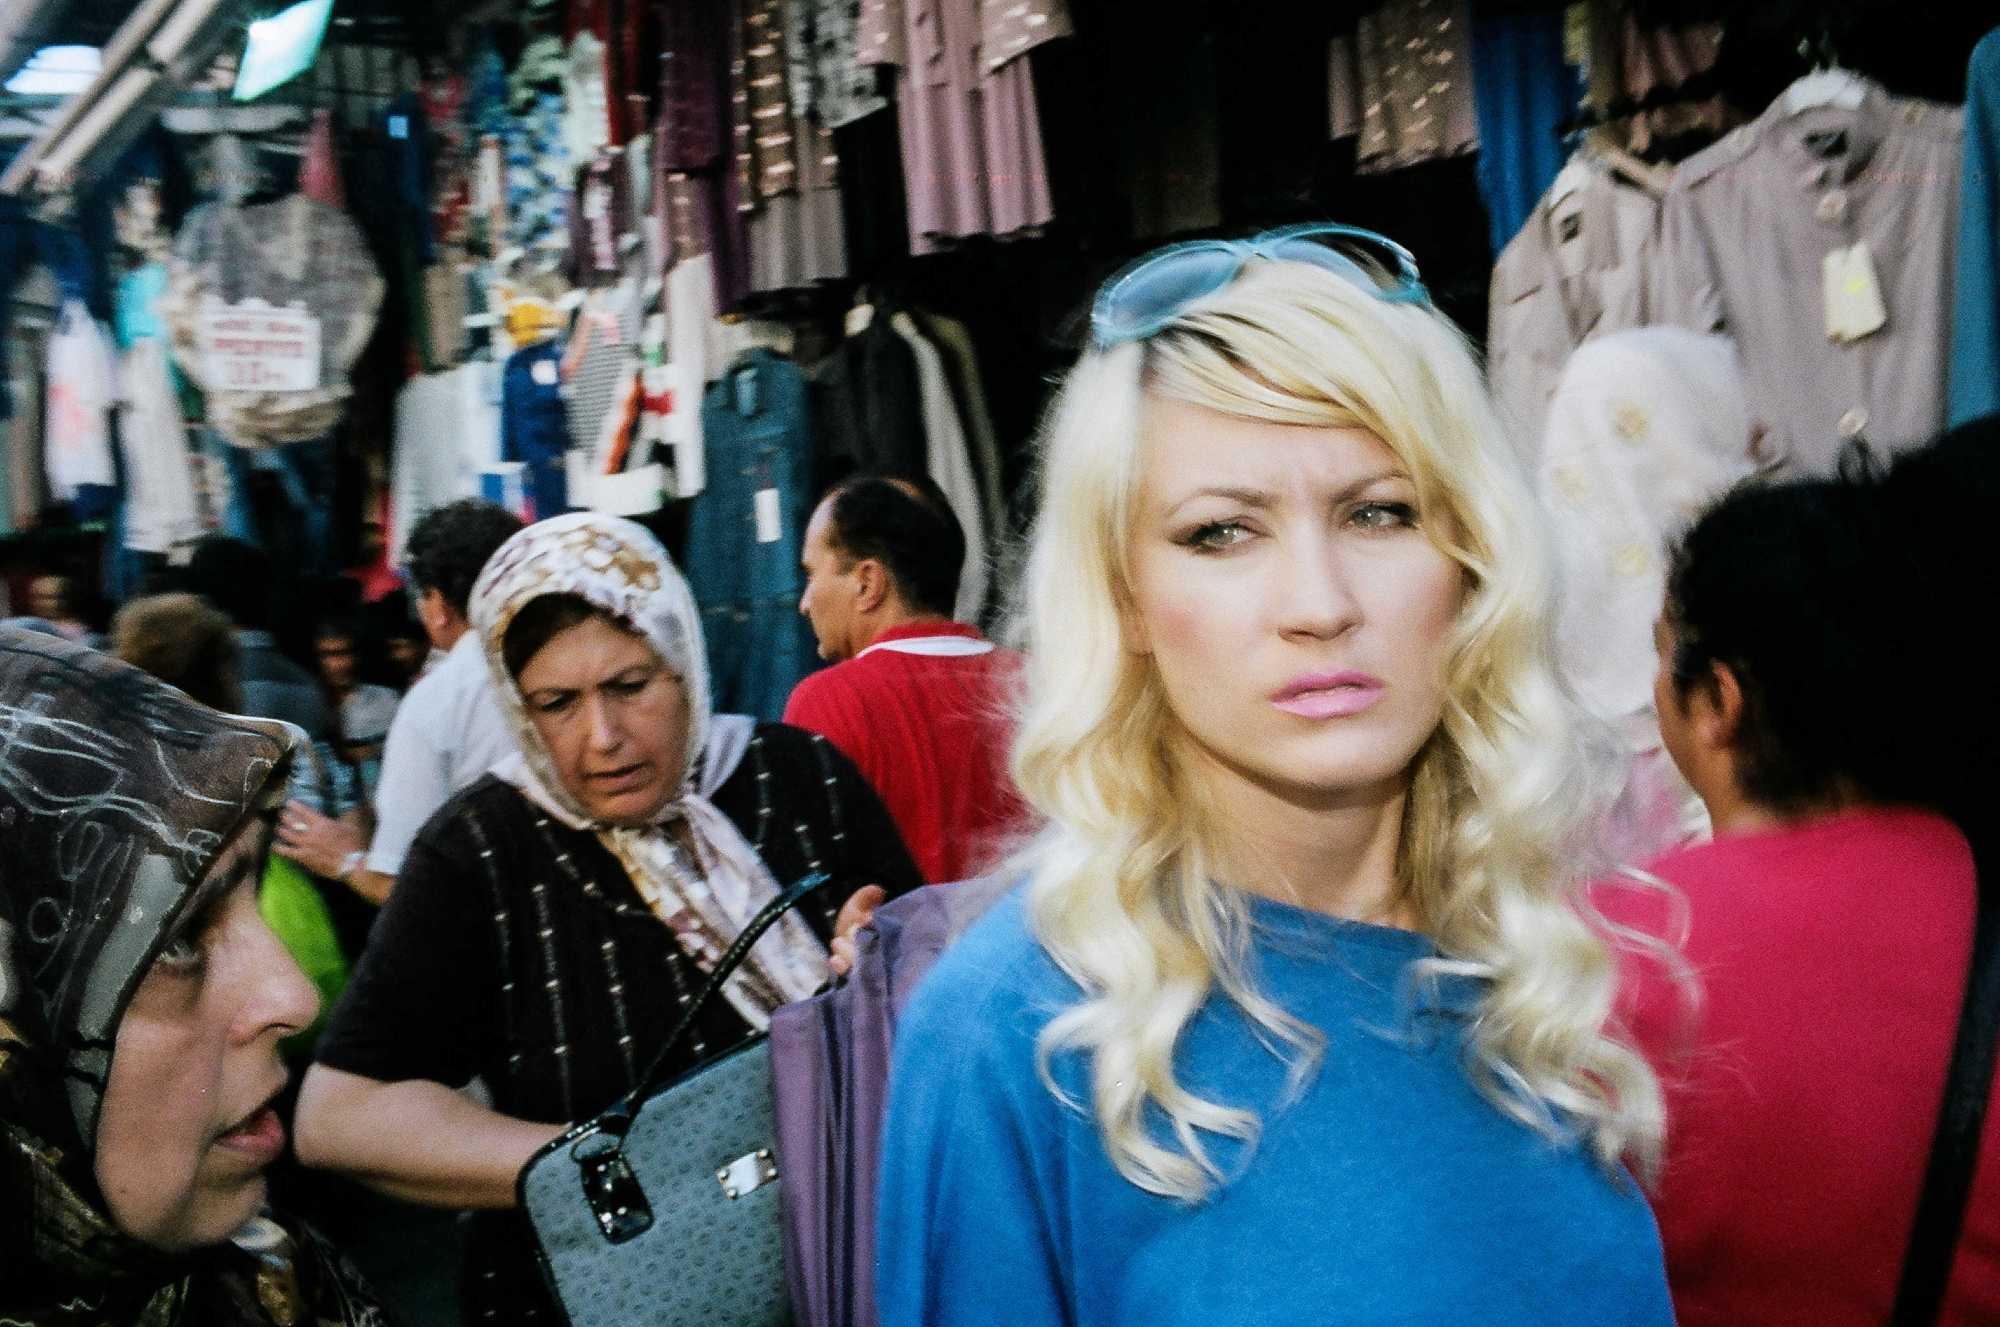 Istanbul, 2015